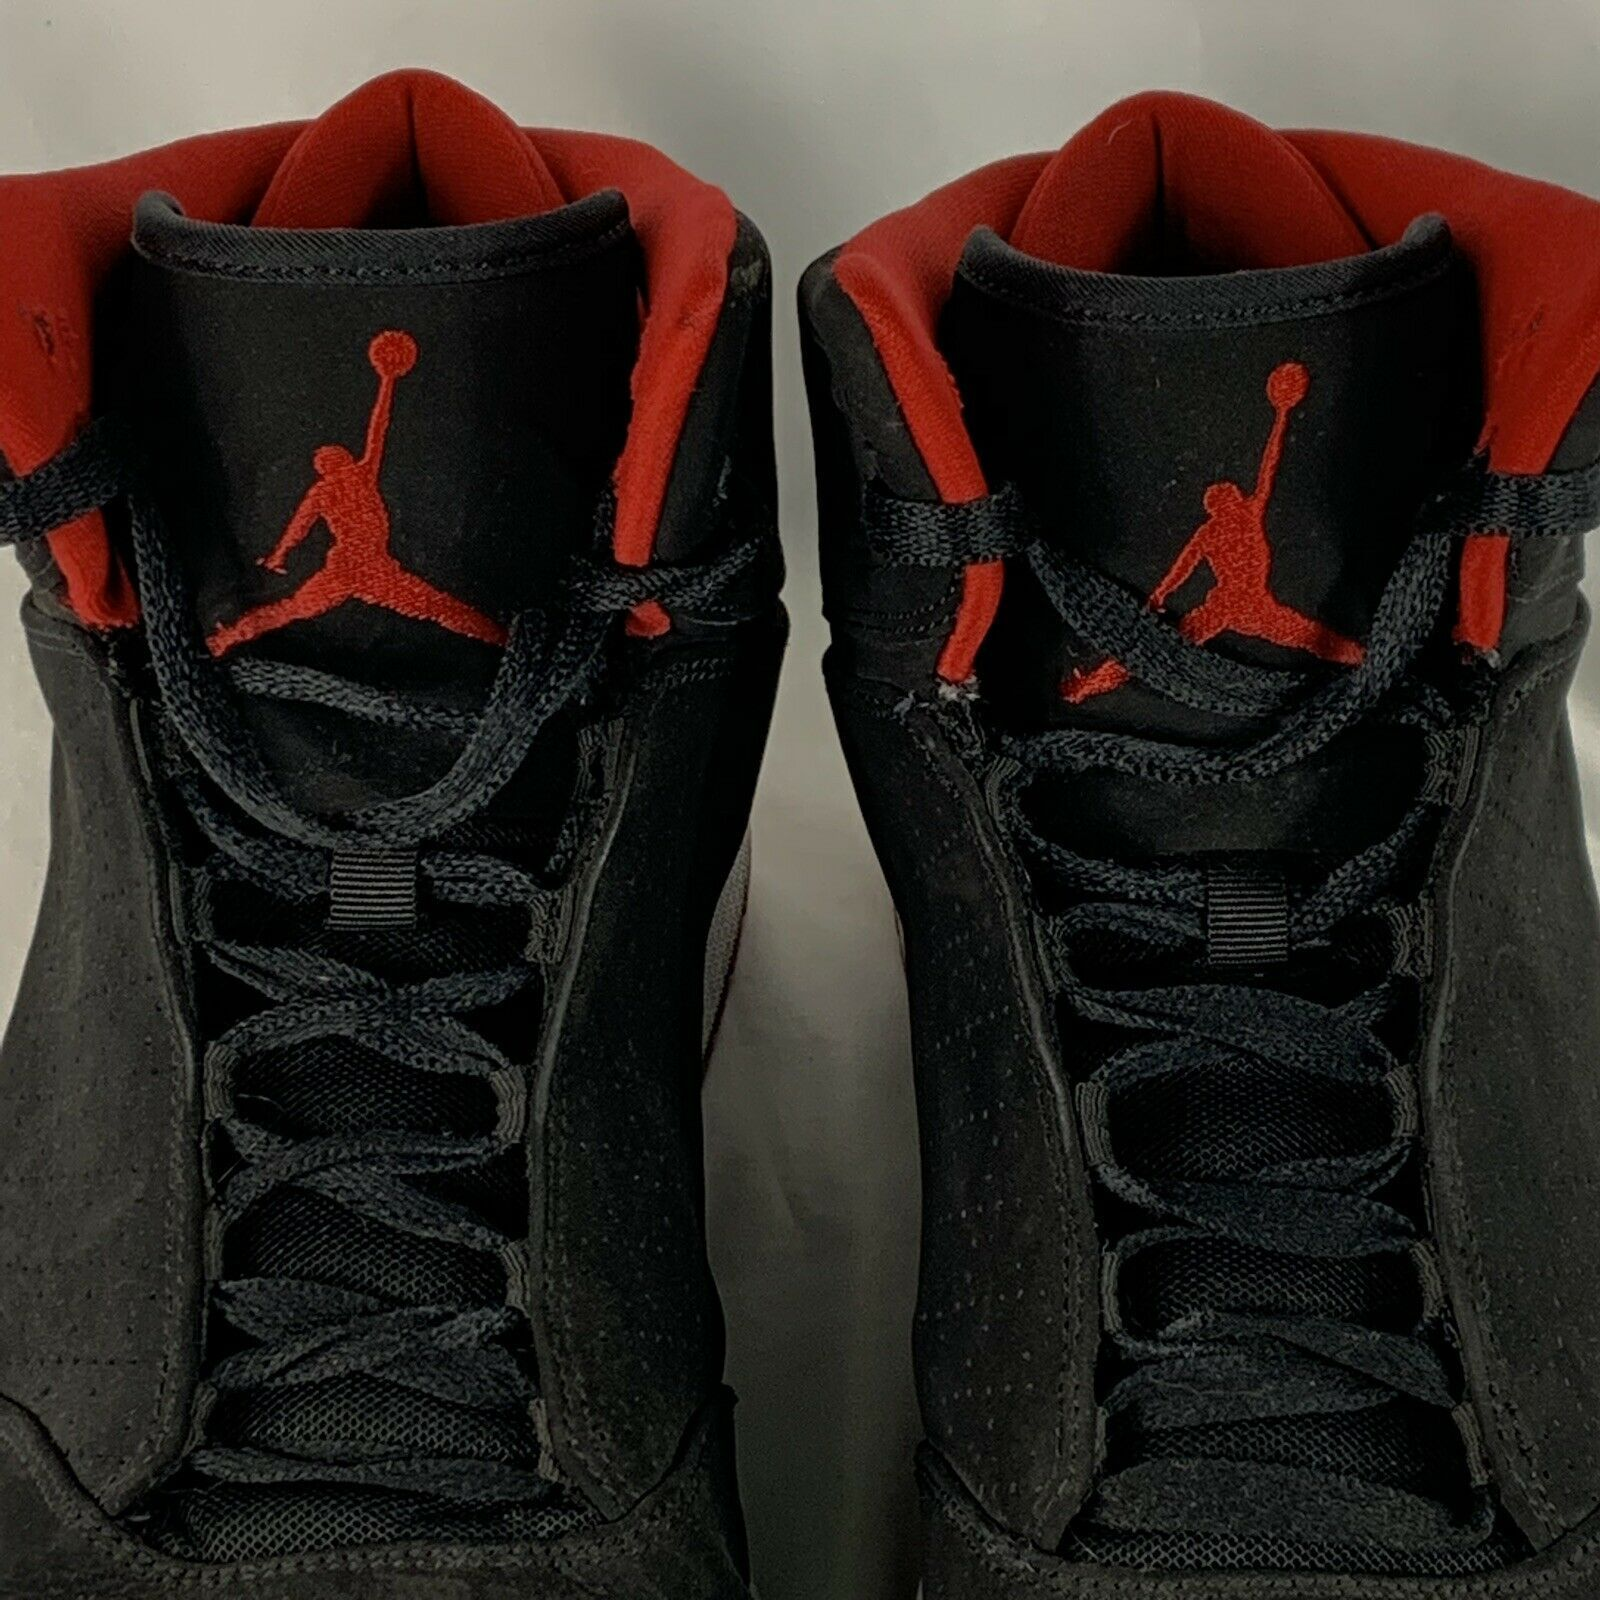 50 Black Items Premium 1 5 Similar And Flight Nike Jordan Air Gym kN08wPnOX